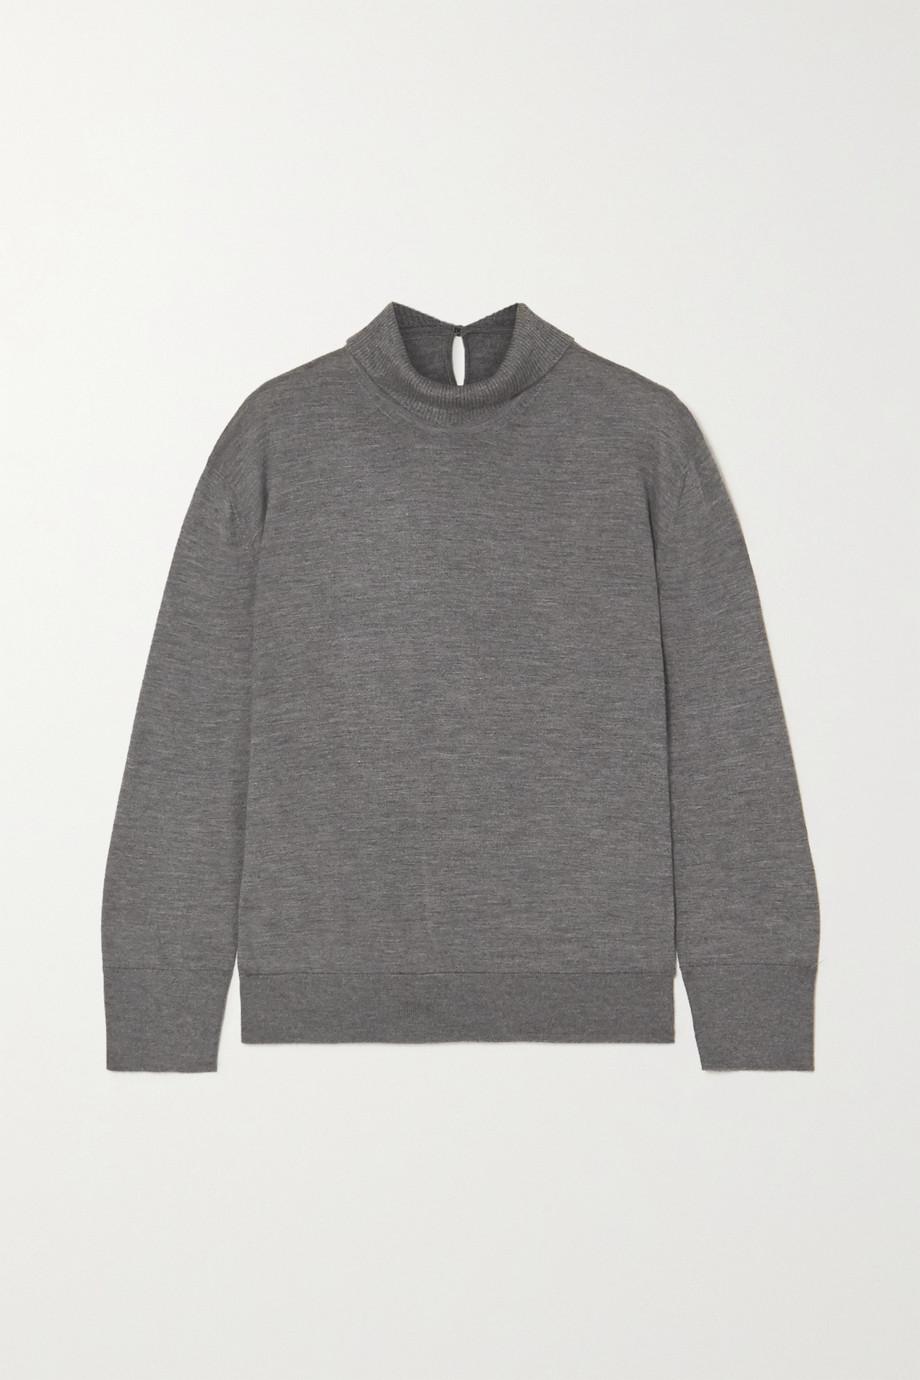 Loro Piana Lupetto mélange cashmere and silk-blend turtleneck sweater